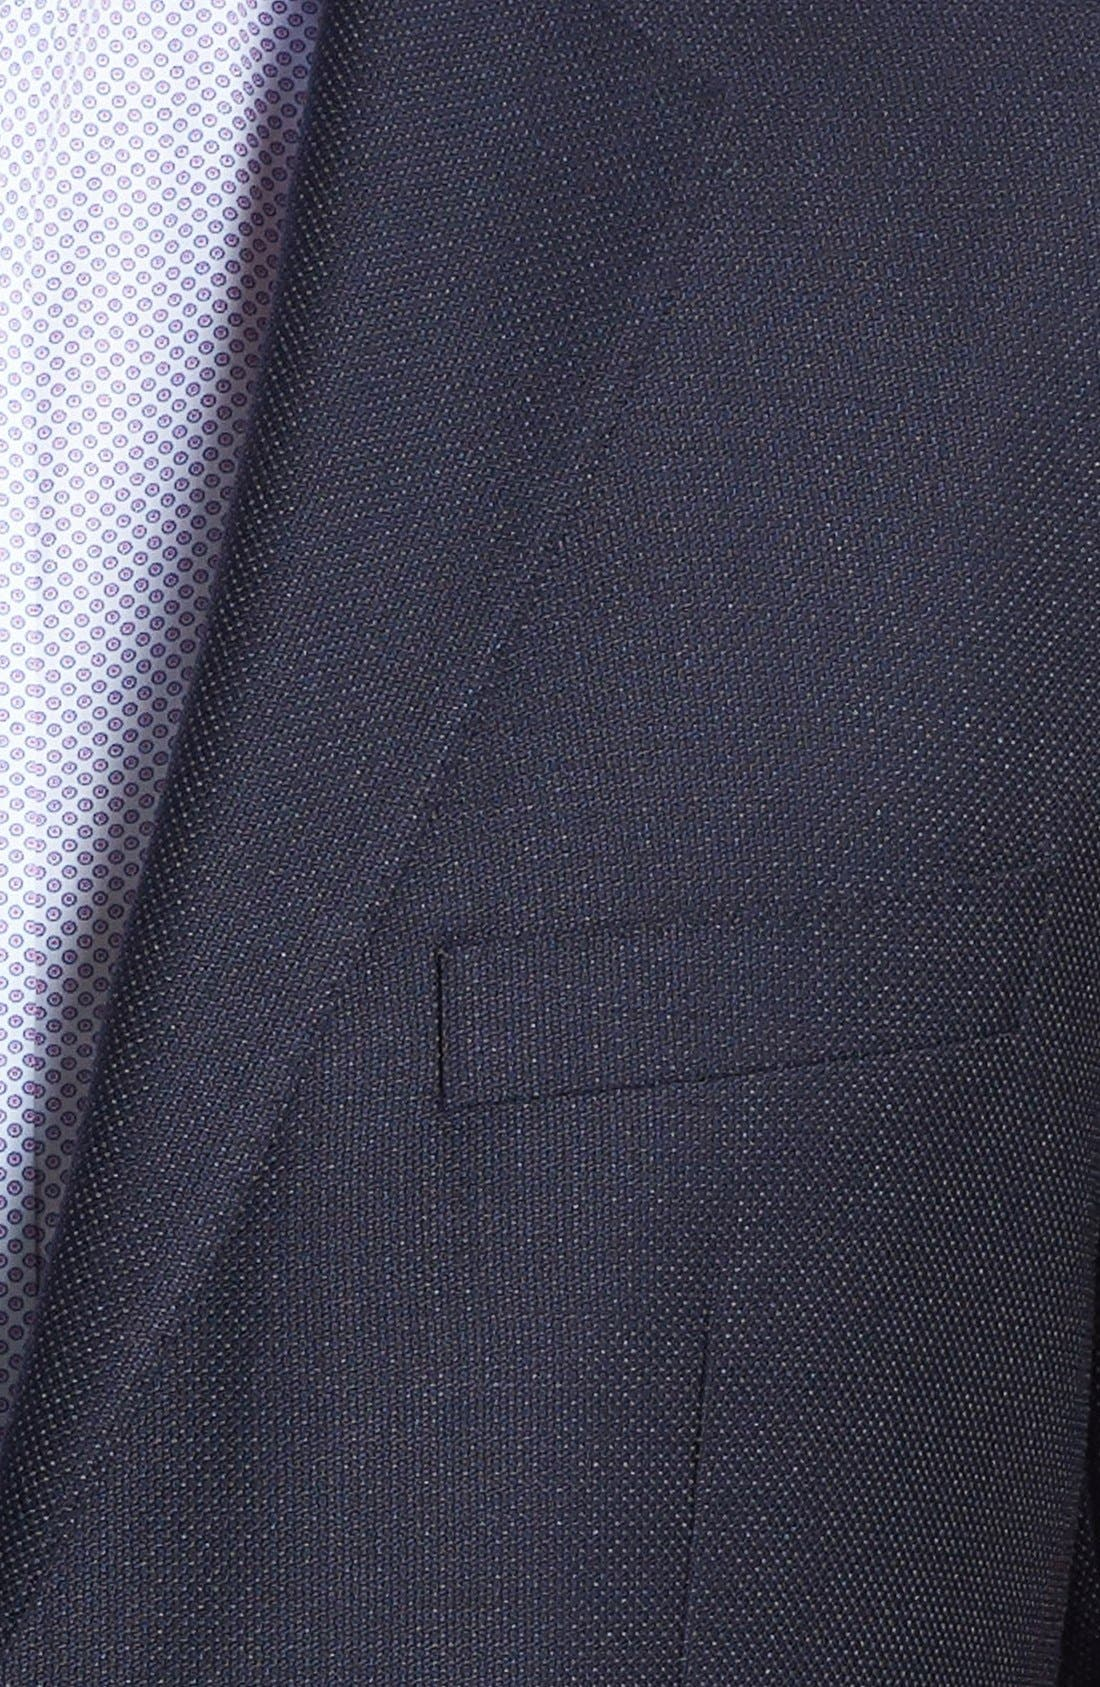 Alternate Image 2  - BOSS Black 'The Keys' Trim Fit Wool Blazer